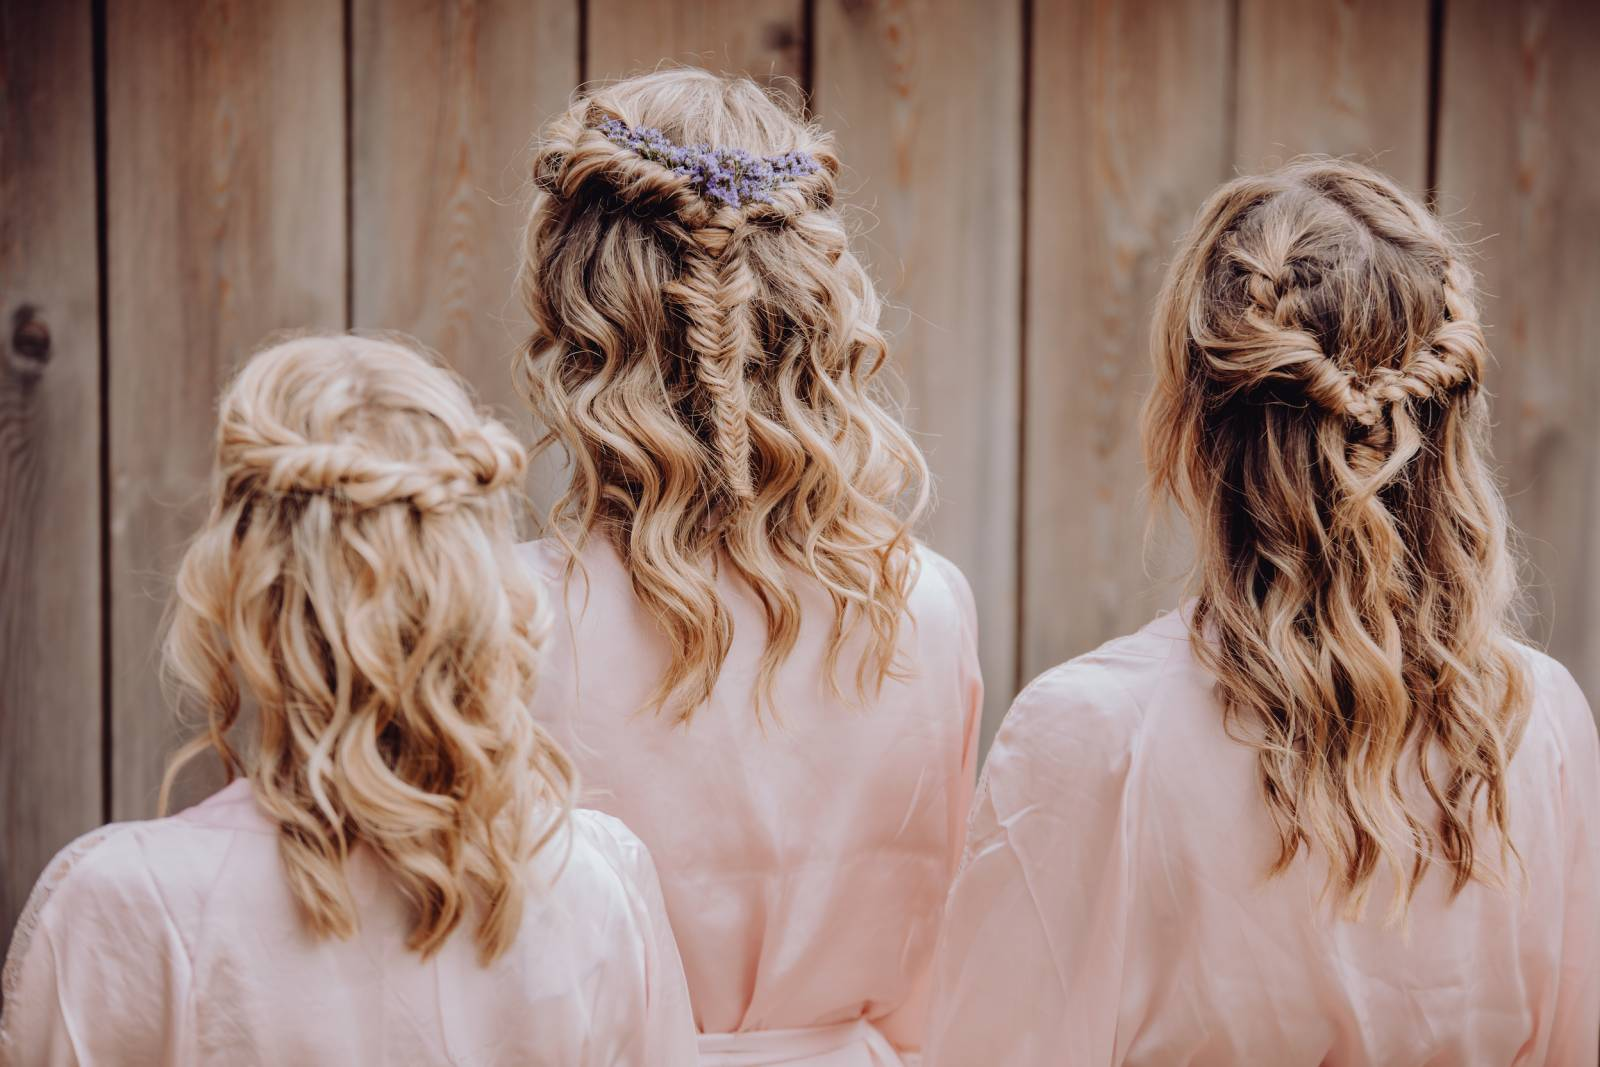 Eline Make-Up & Hair ZE Foto LUX Visual  story tellers - House of Weddings